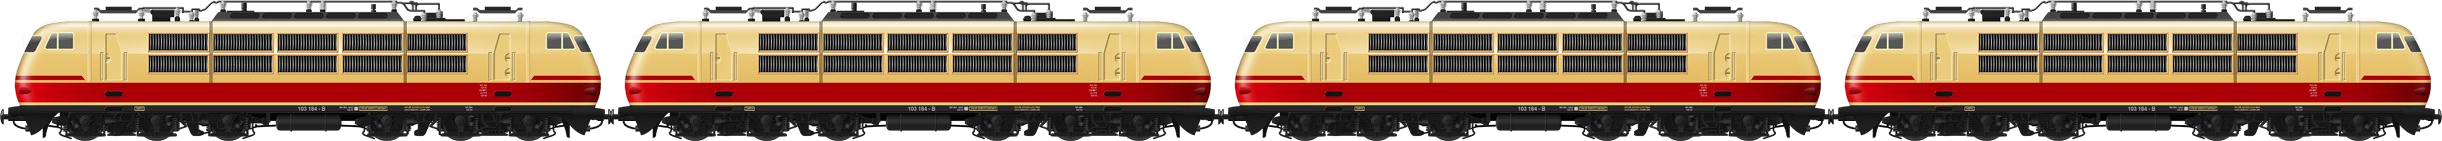 DB 103 Express I